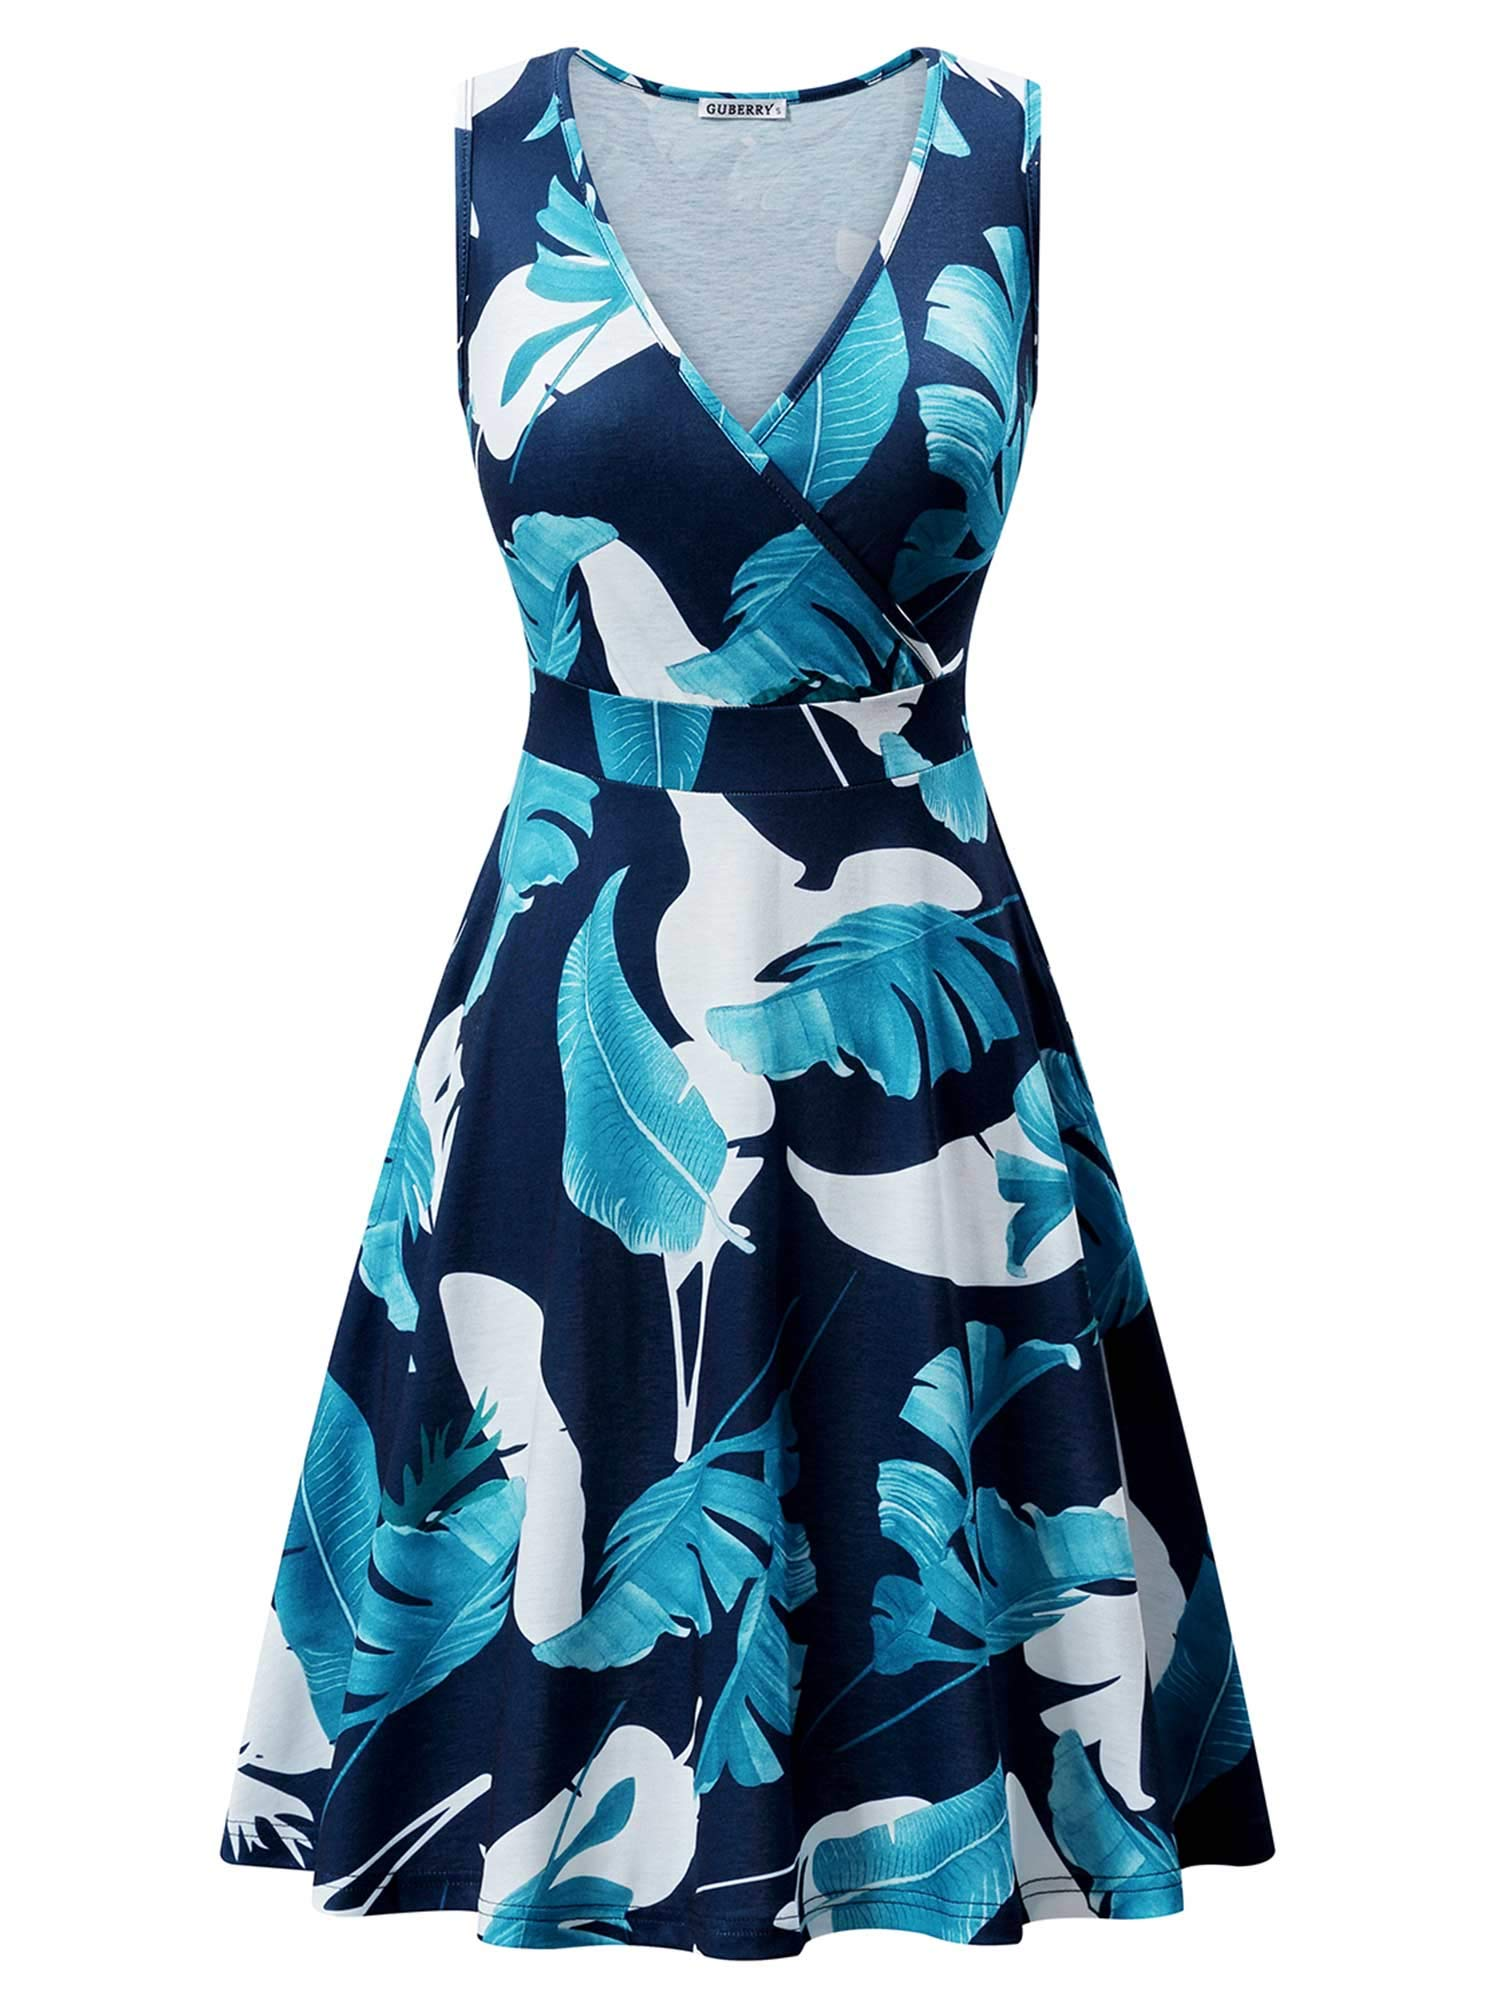 Available at Amazon: GUBERRY Women's Deep V Neck Sleeveless Cross Wrap Casual Flare Midi Tank Dress with Pockets